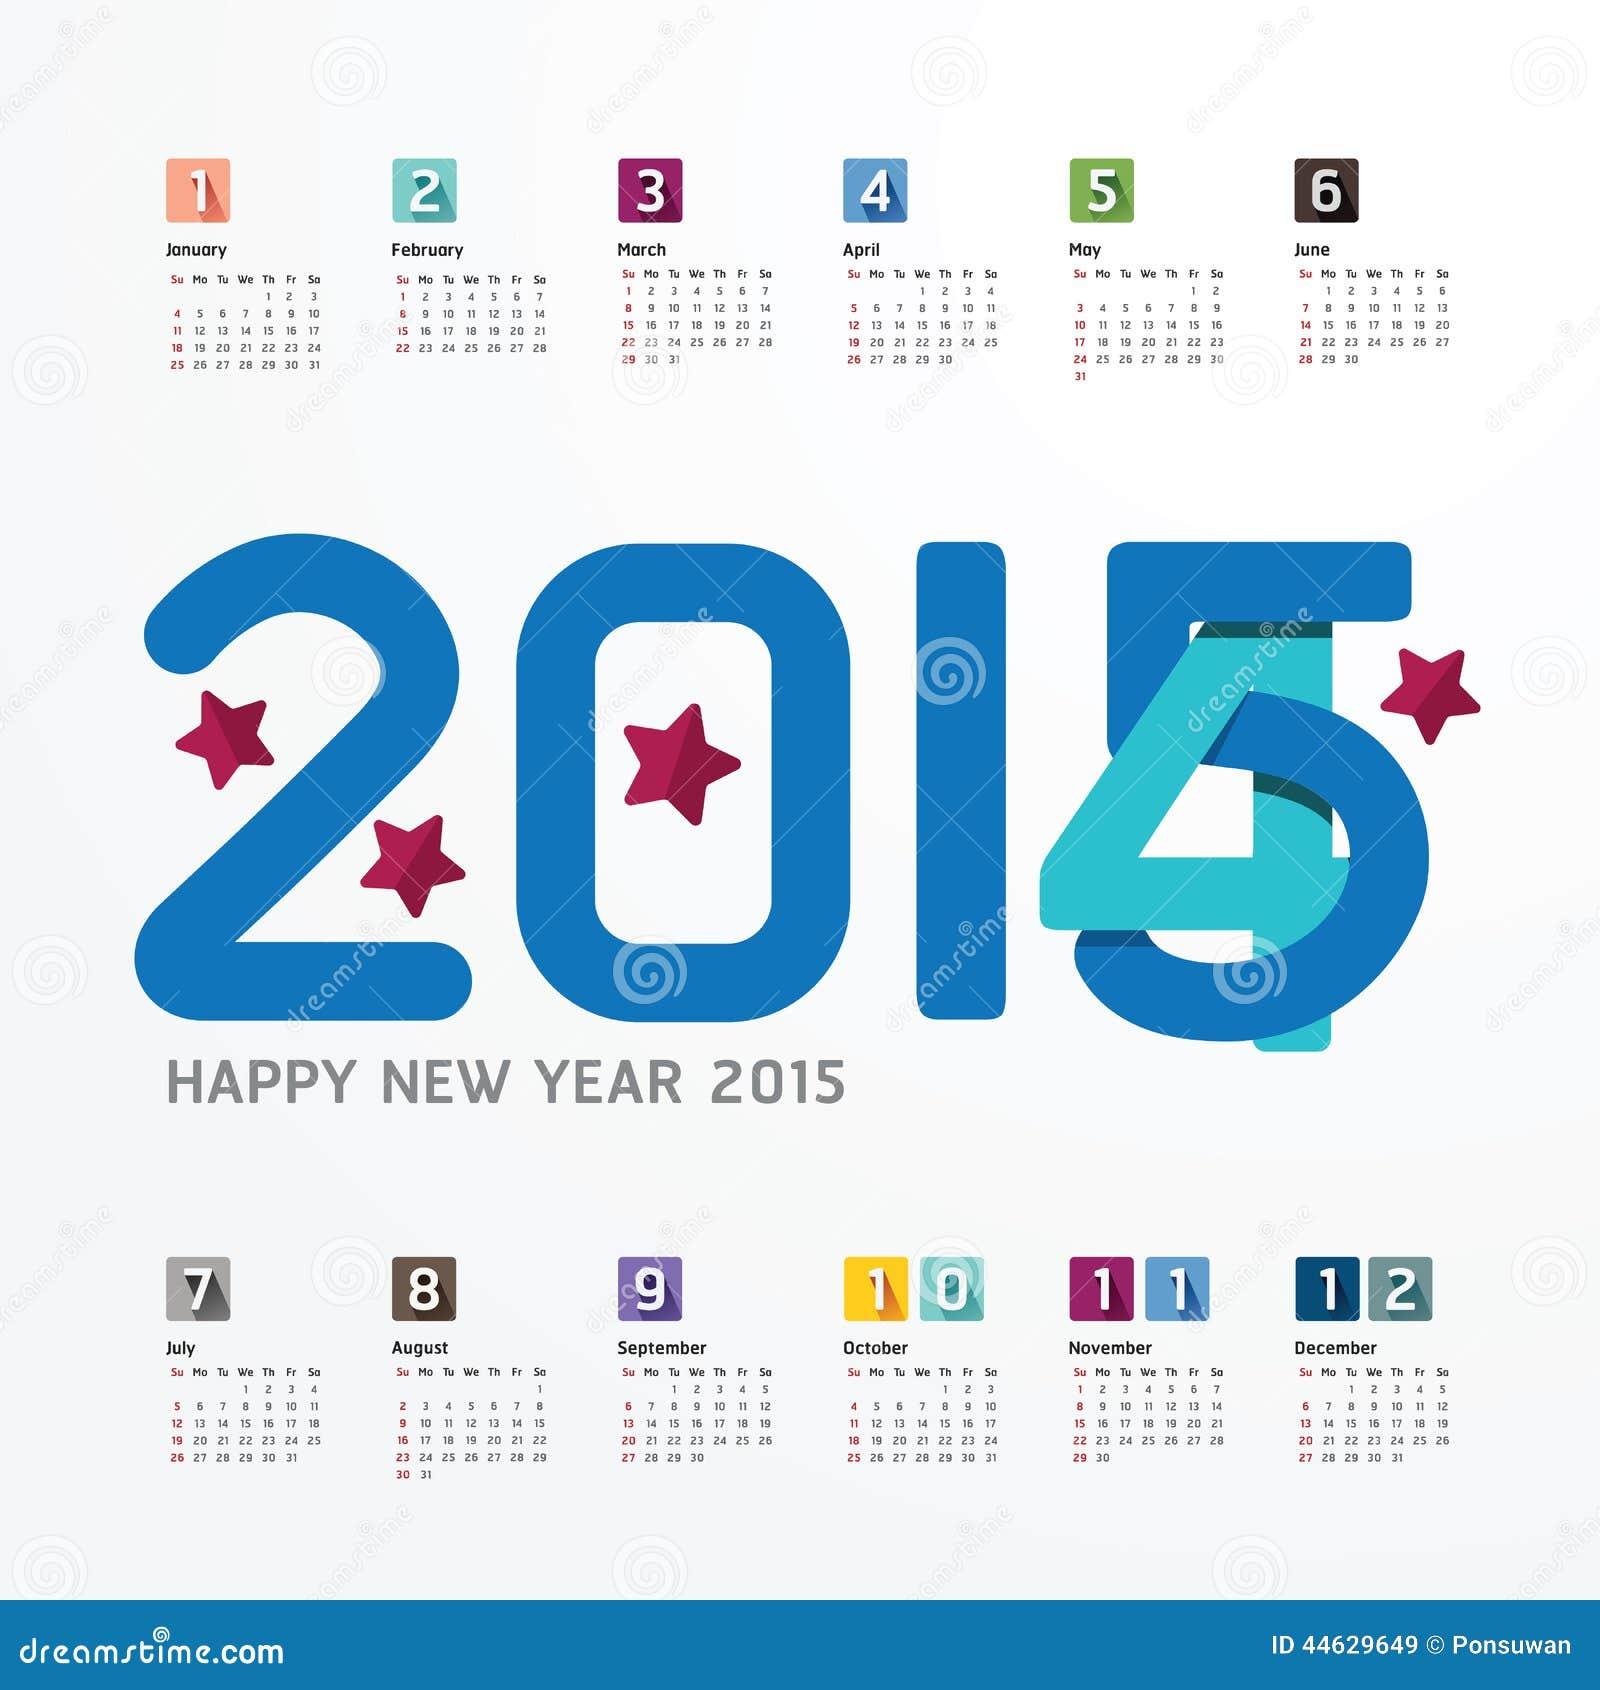 New Year Calendar Designs : Calendar happy new year design